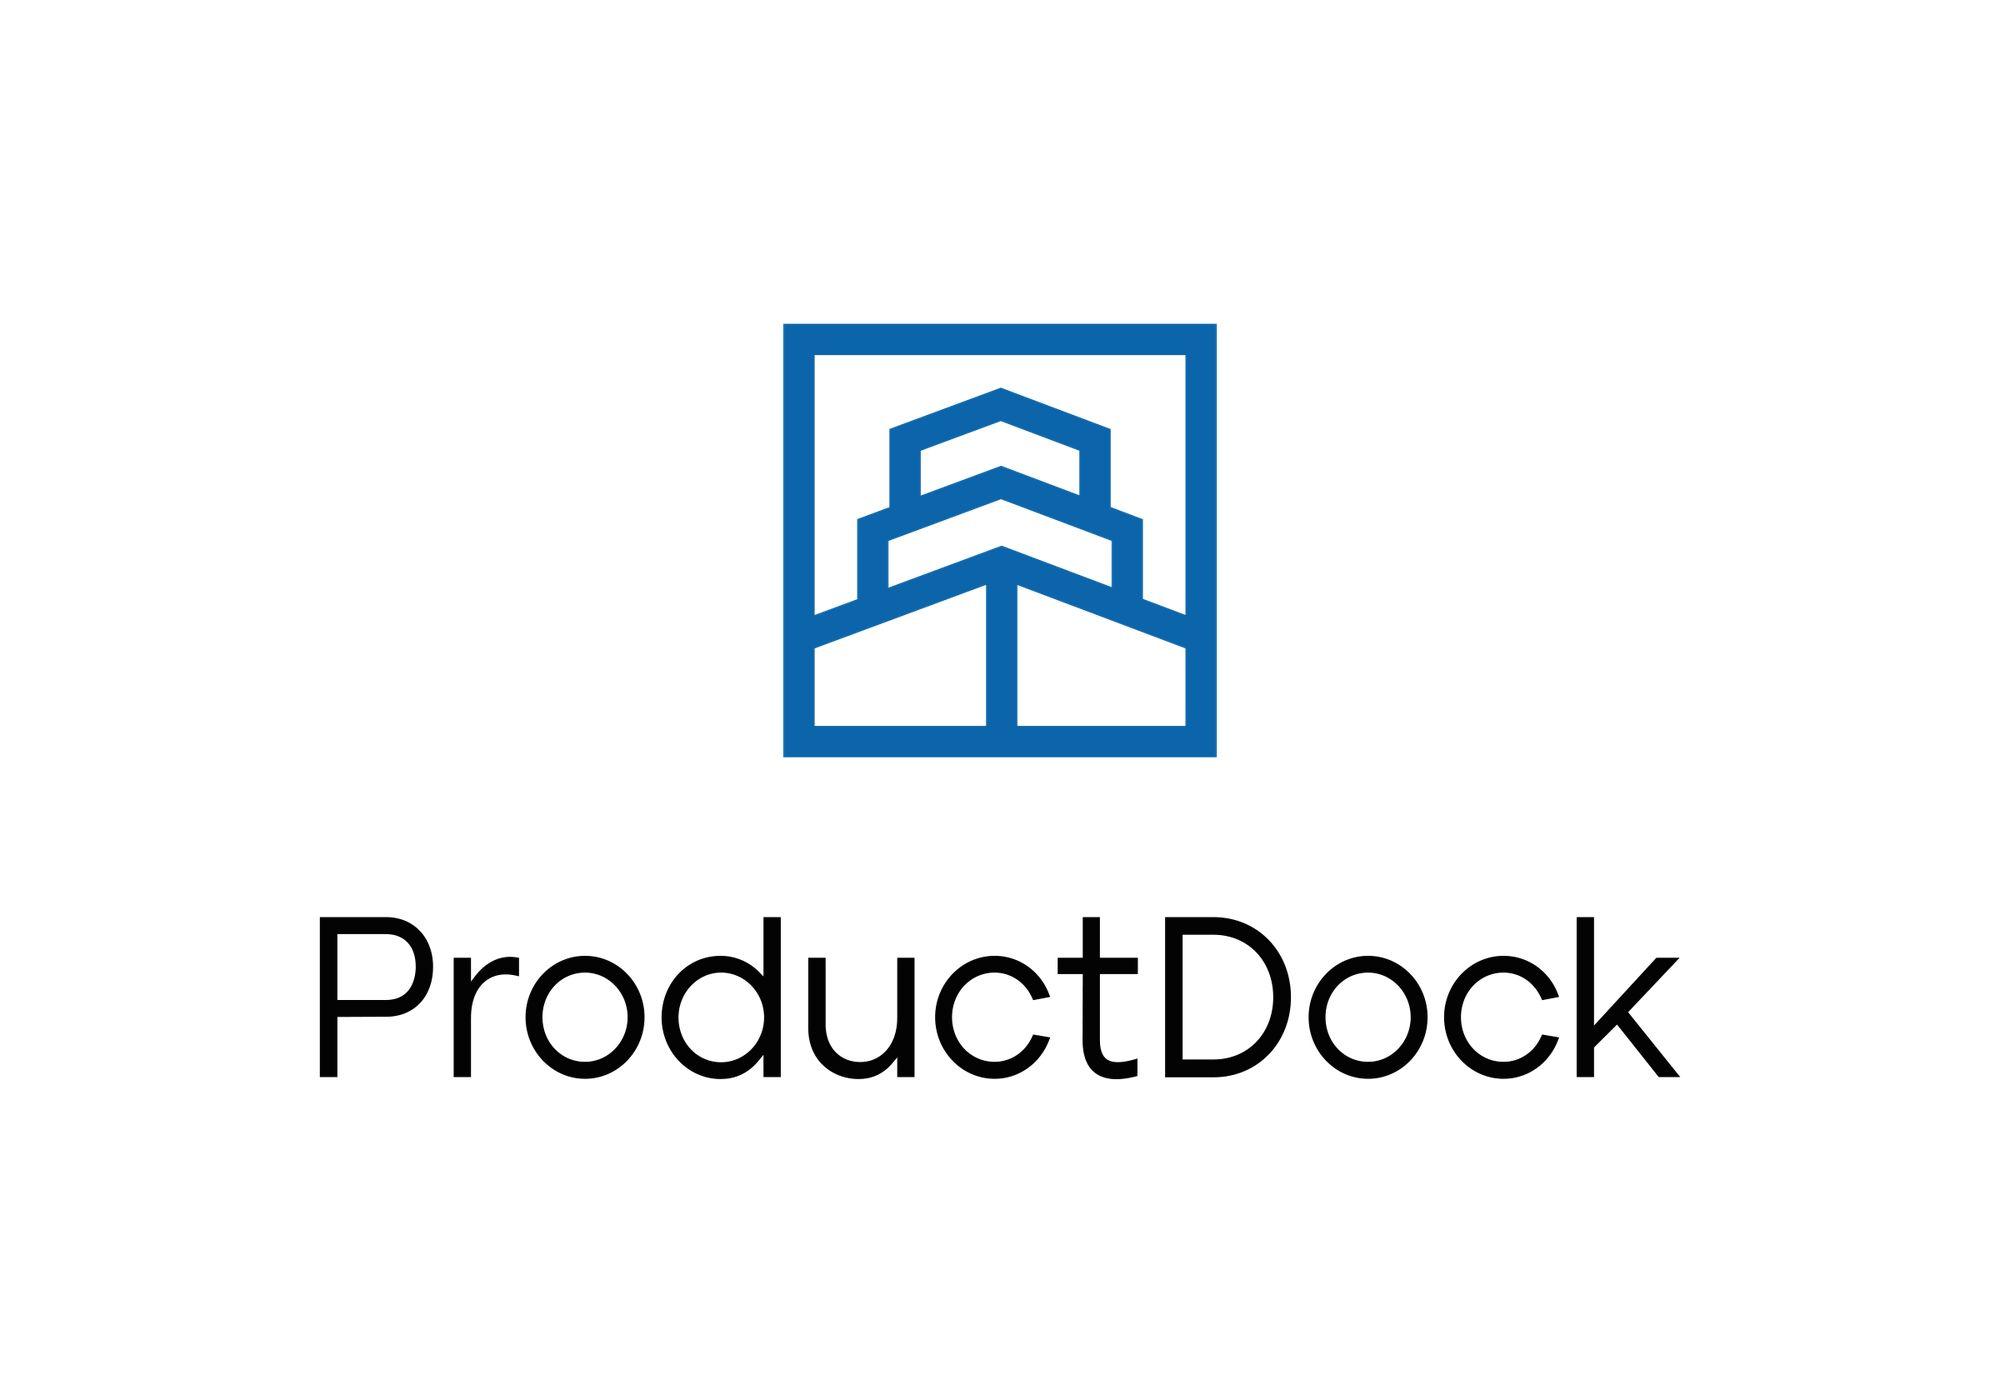 ProductDock